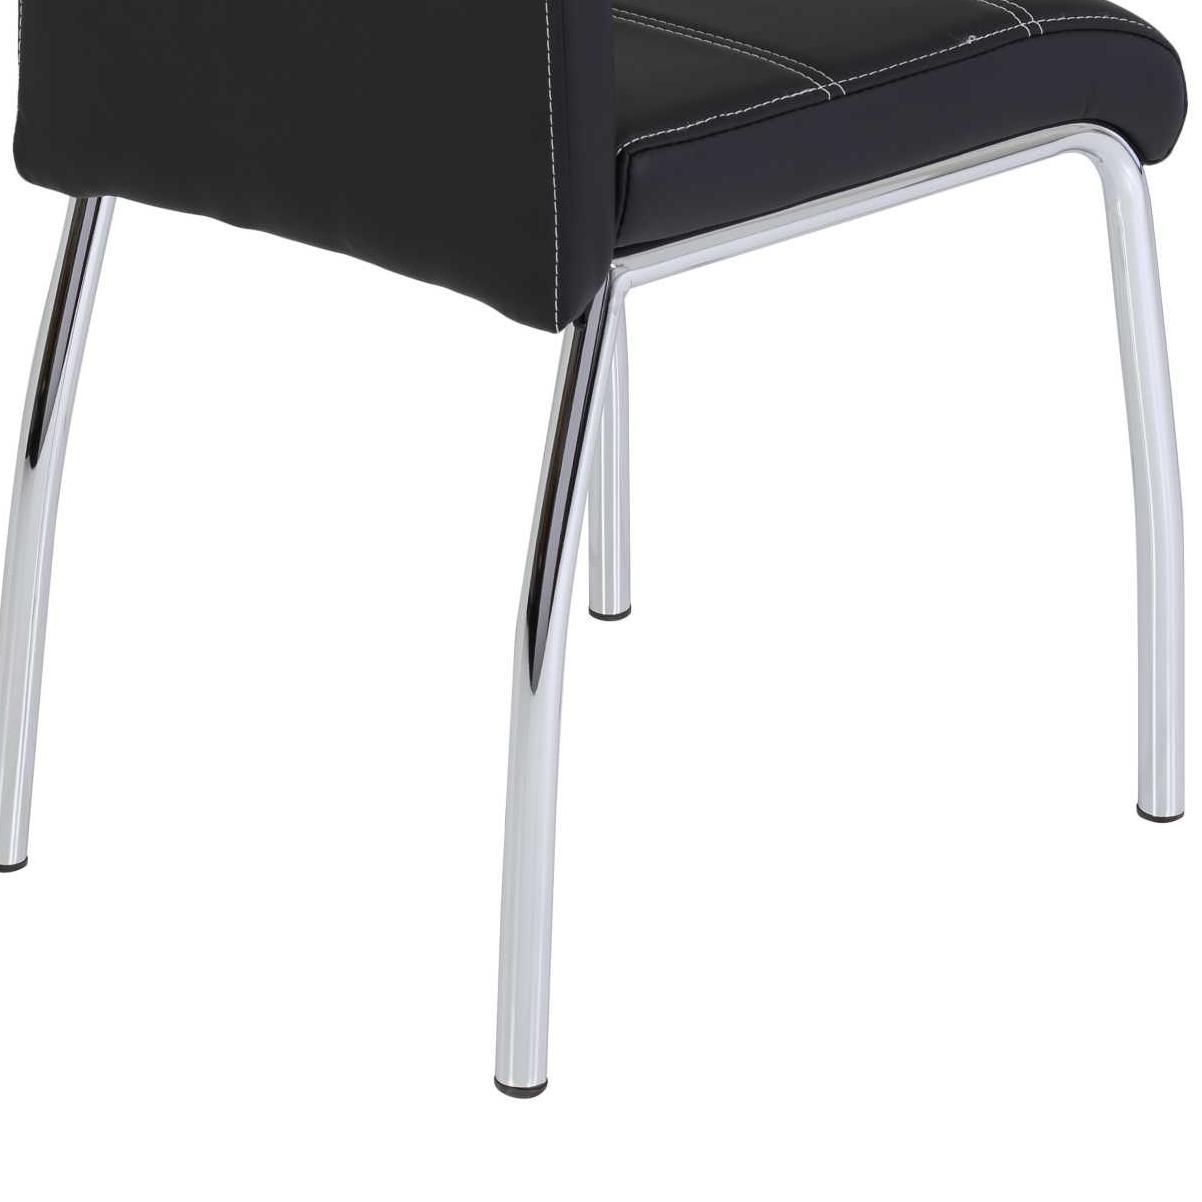 6 Stühle=Set Vierfussstuhl Stuhl Susi S 03 Kunstleder schwarz